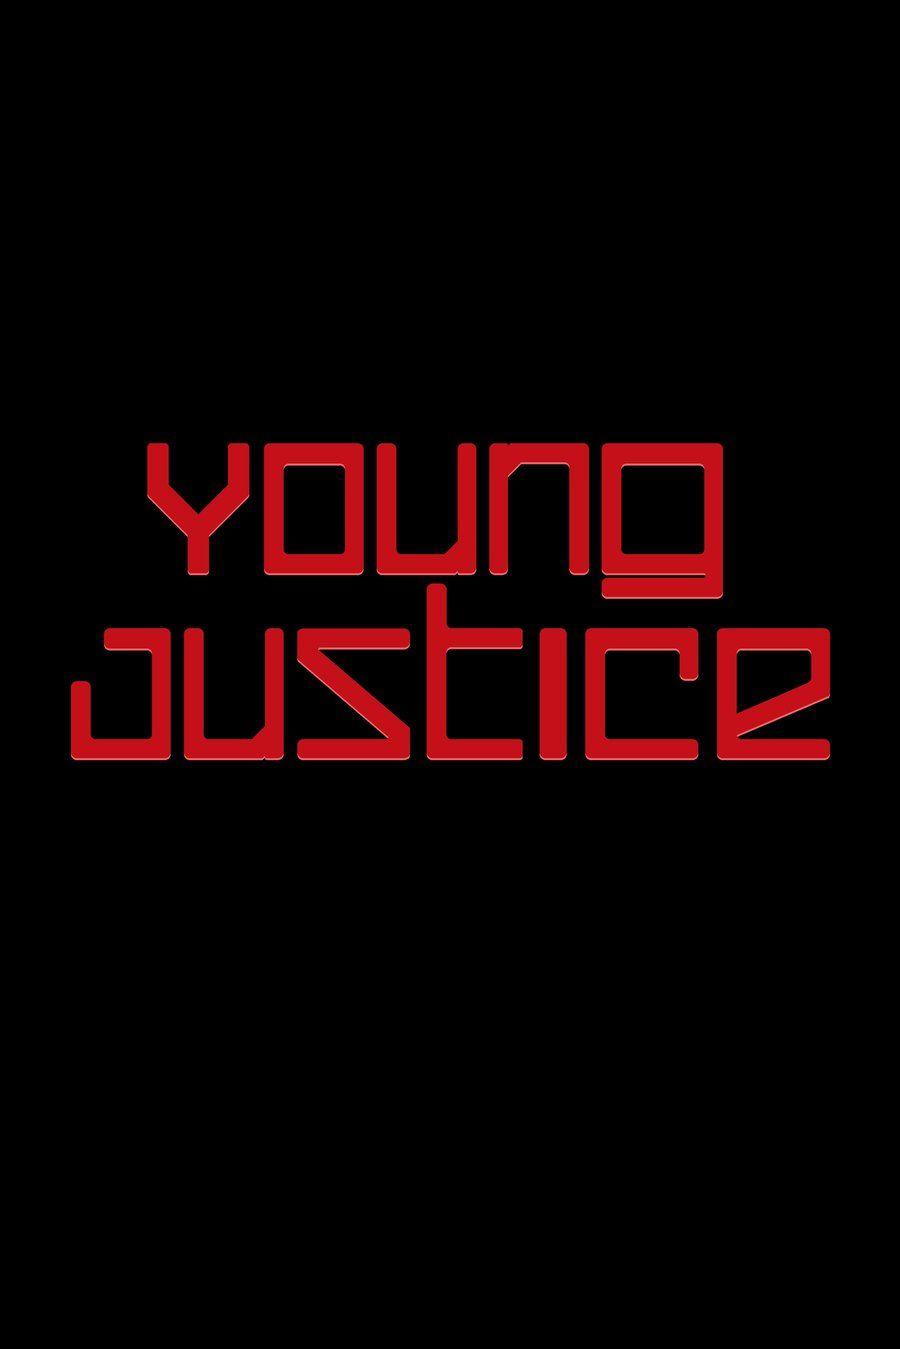 Young Justice logo by portfan.deviantart.com on @DeviantArt